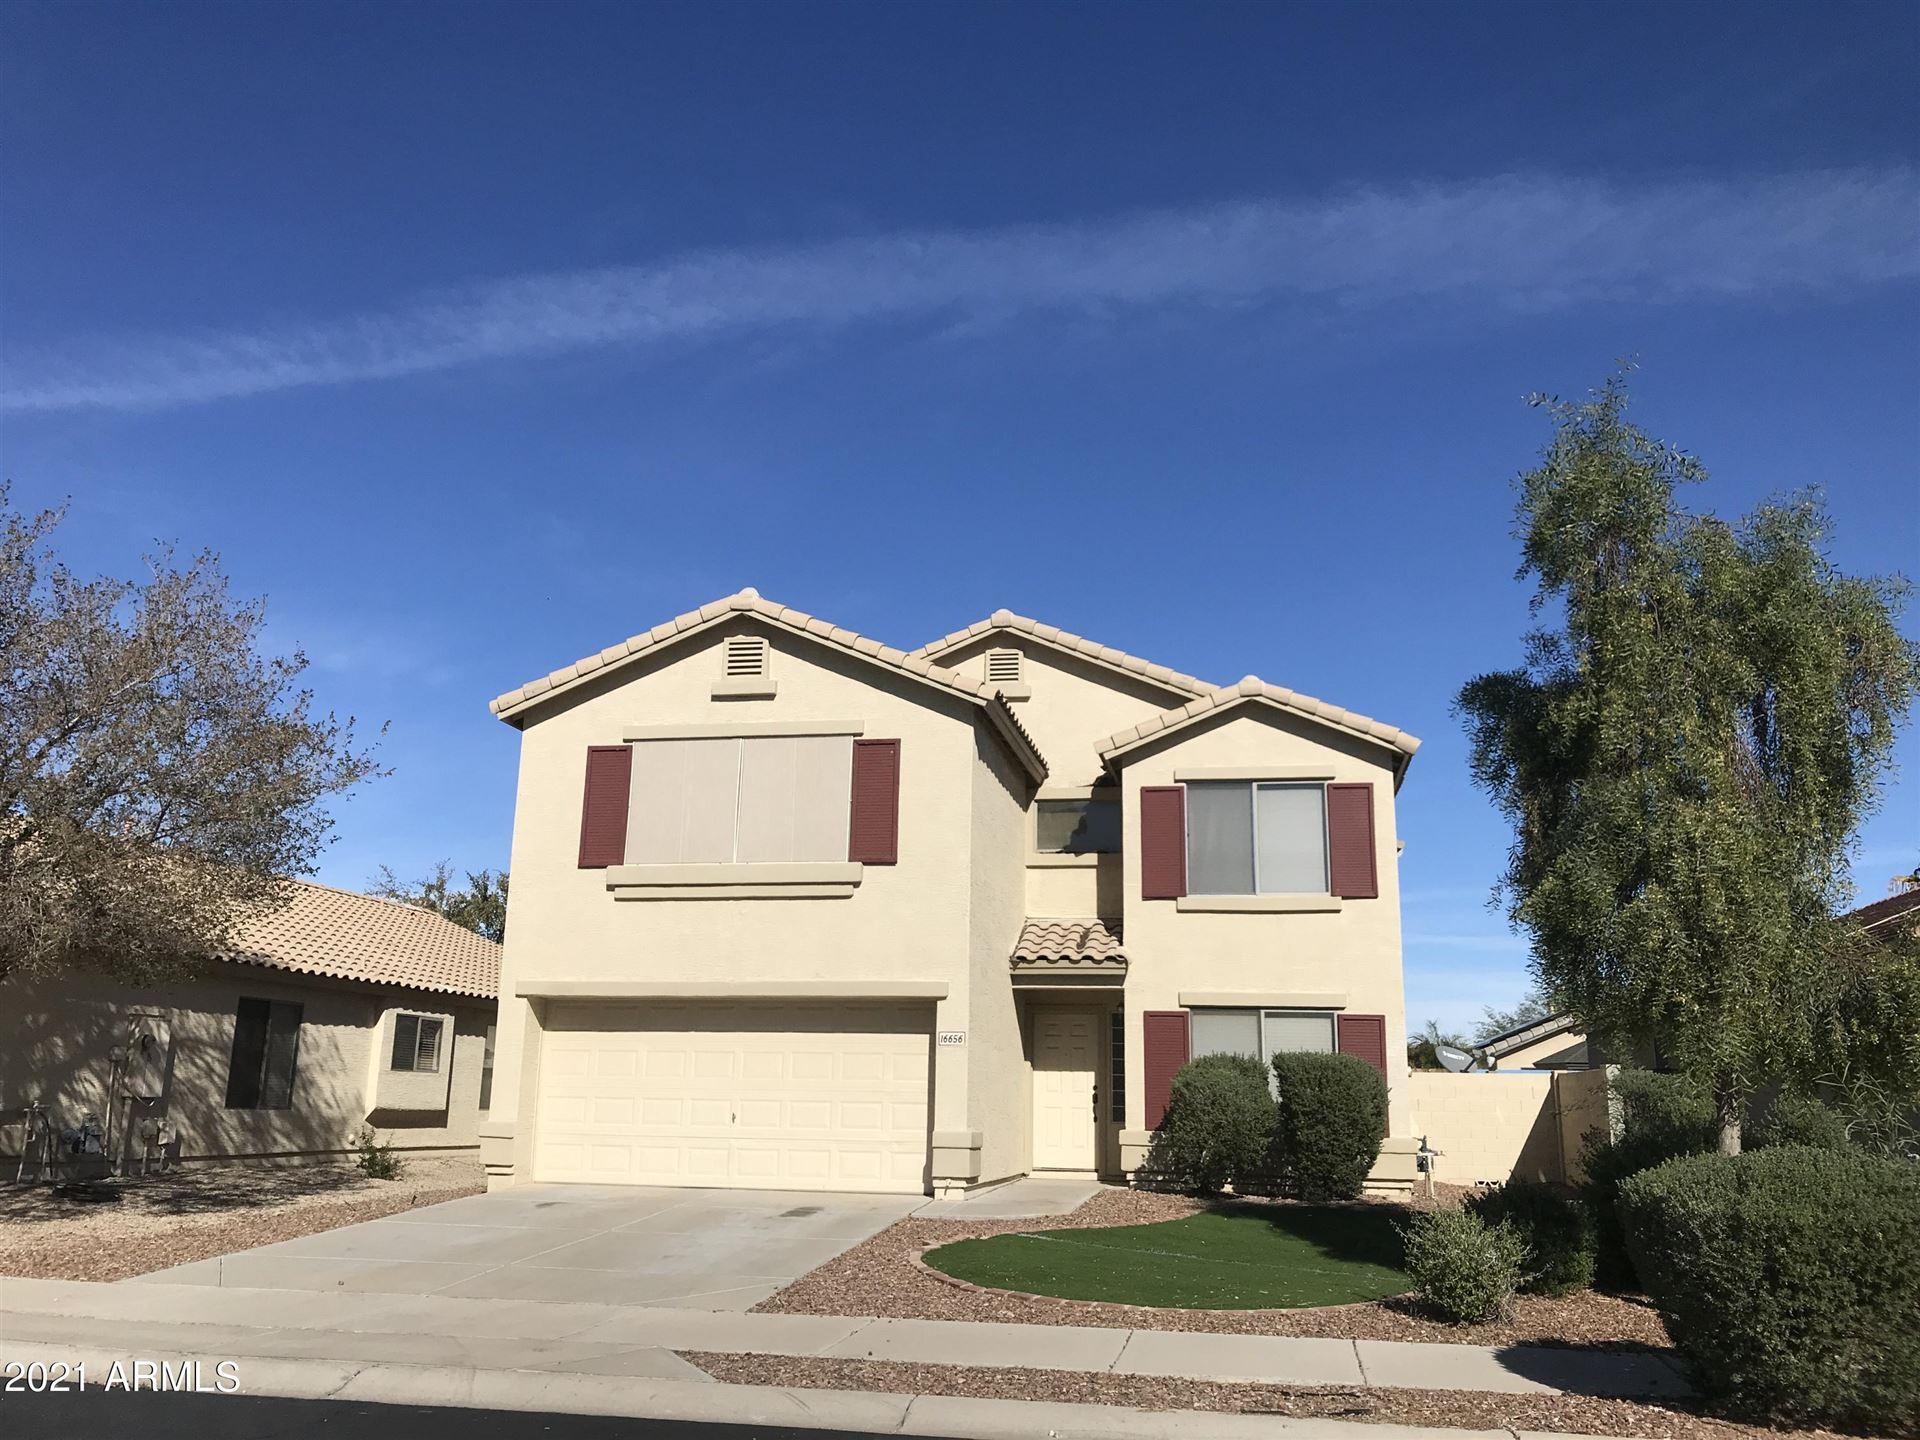 Photo of 16656 W Polk Street, Goodyear, AZ 85338 (MLS # 6200524)